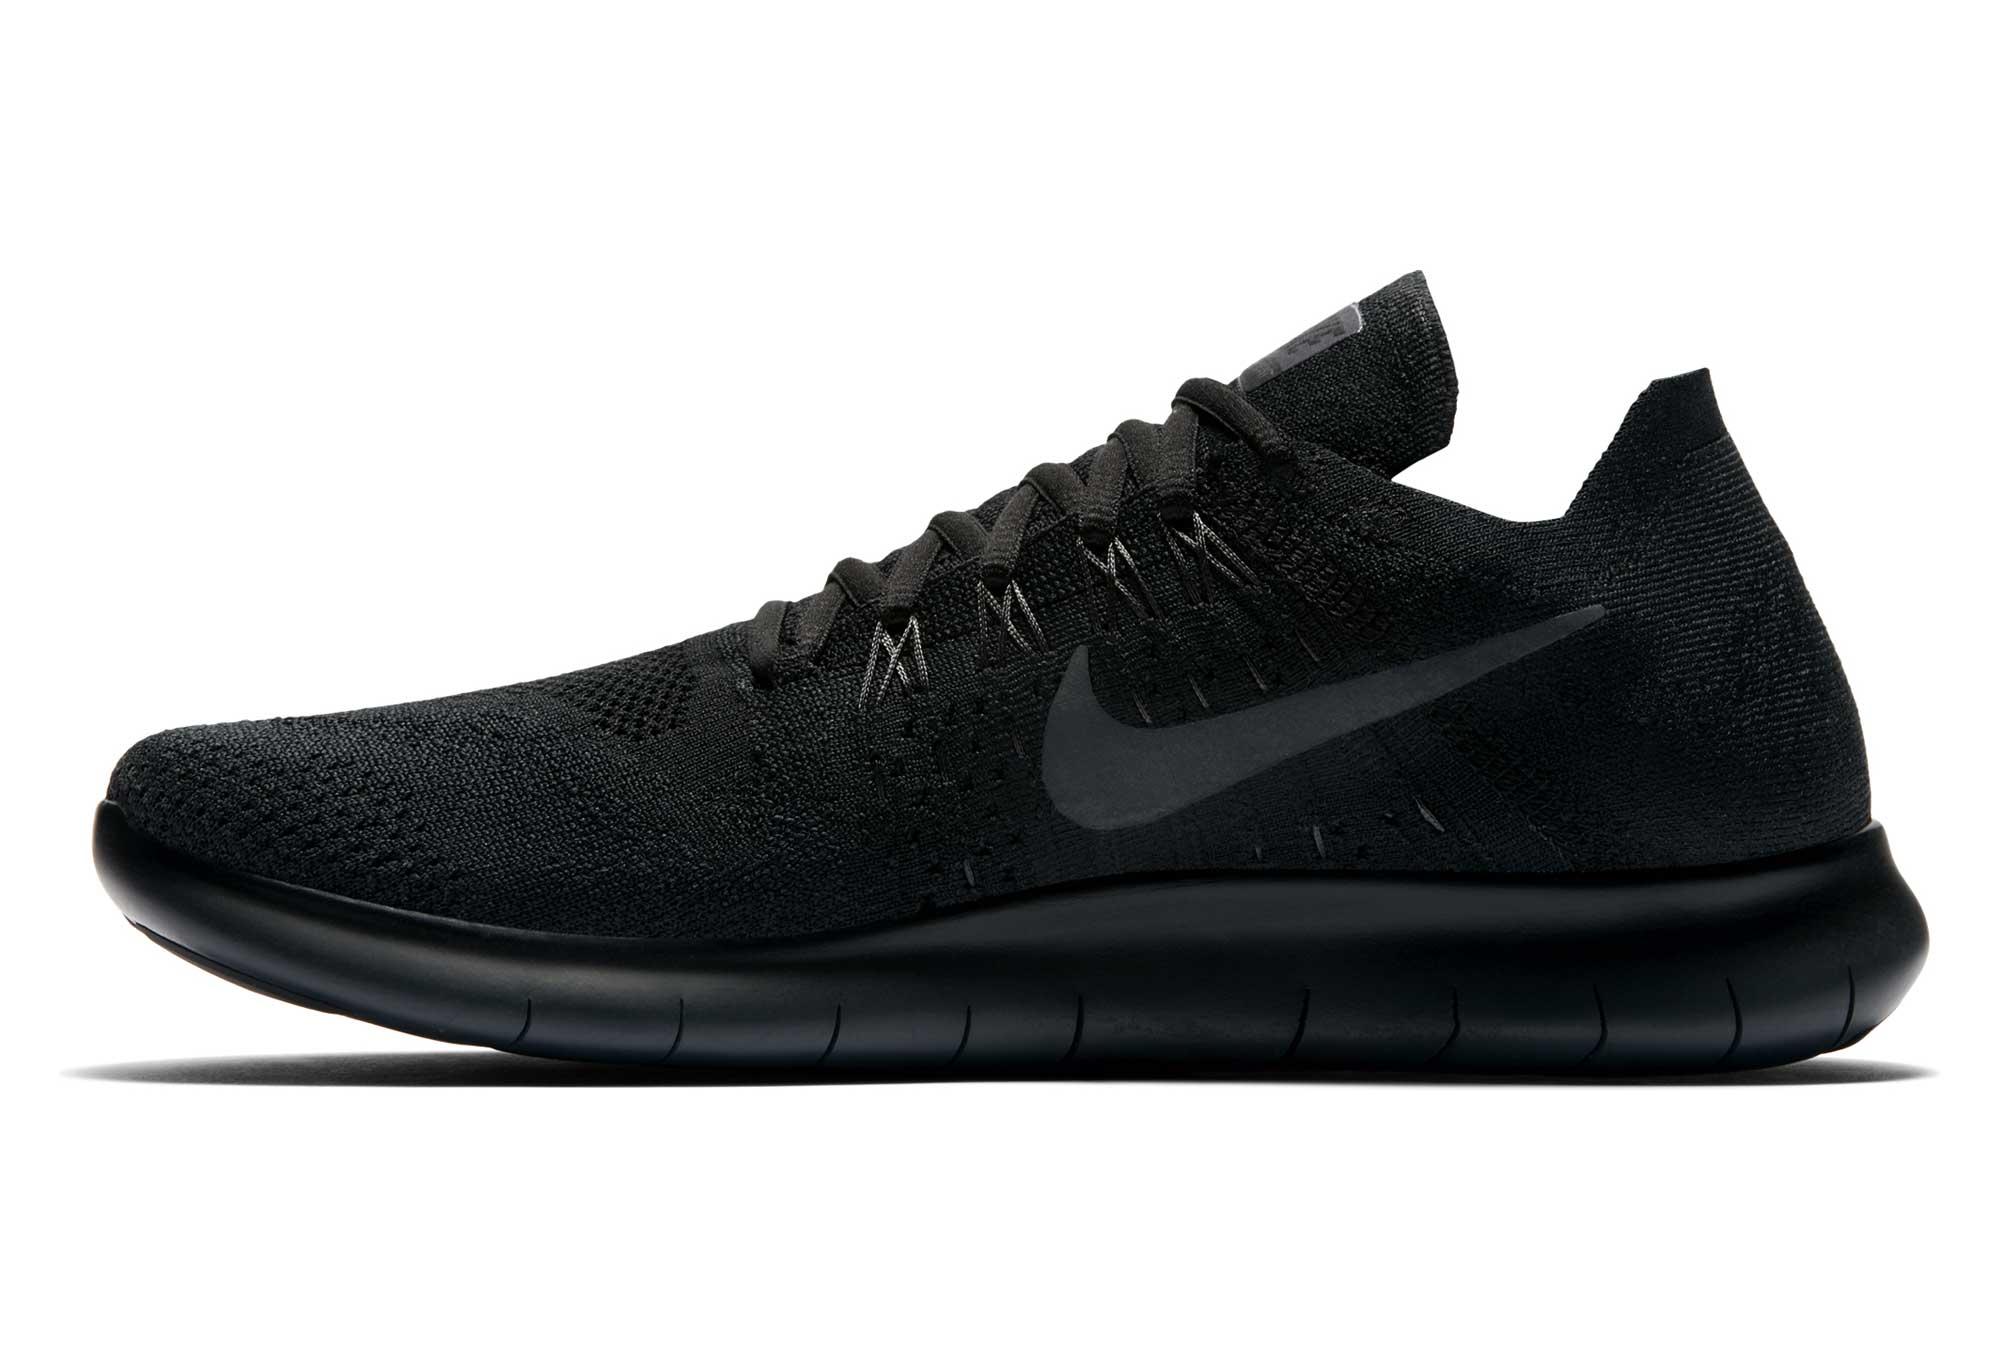 pretty nice 1c091 806c6 Zapatillas de running para mujer Nike Free RN Flyknit 2017 Negro Gris  antracita